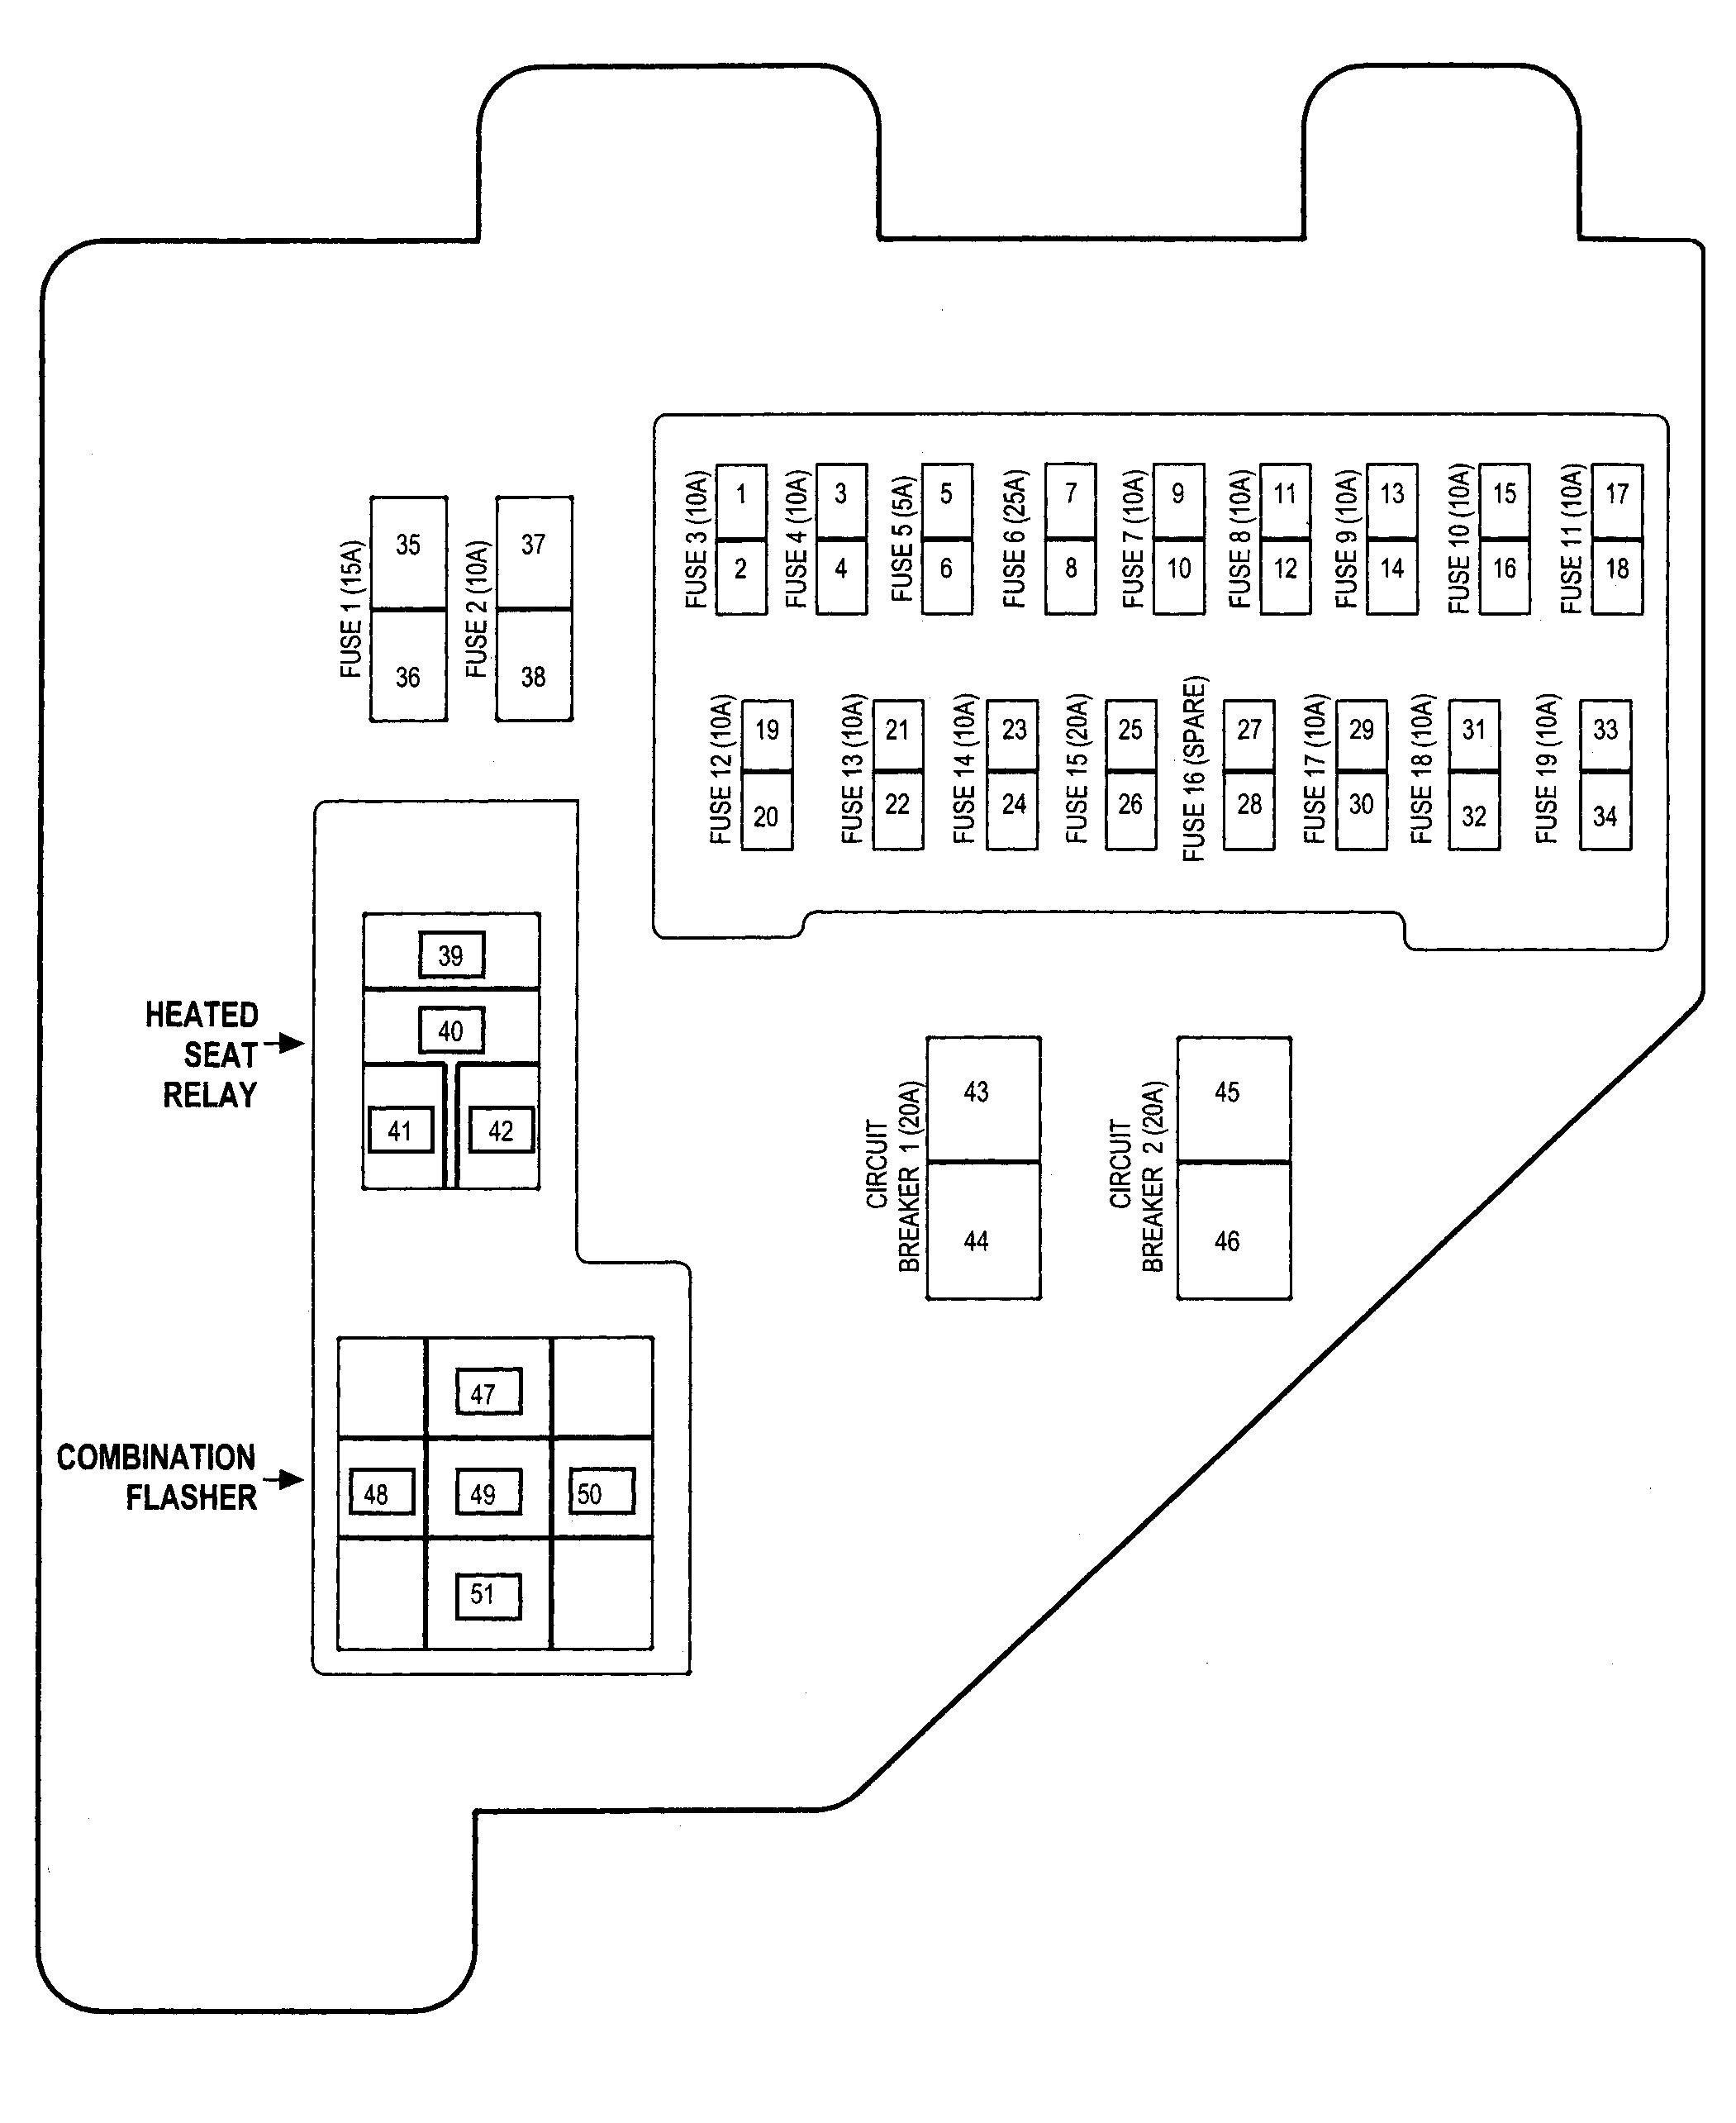 2010 dodge ram 2500 wiring diagram ry 3484  dodge diesel wiring distribution schematic wiring  dodge diesel wiring distribution